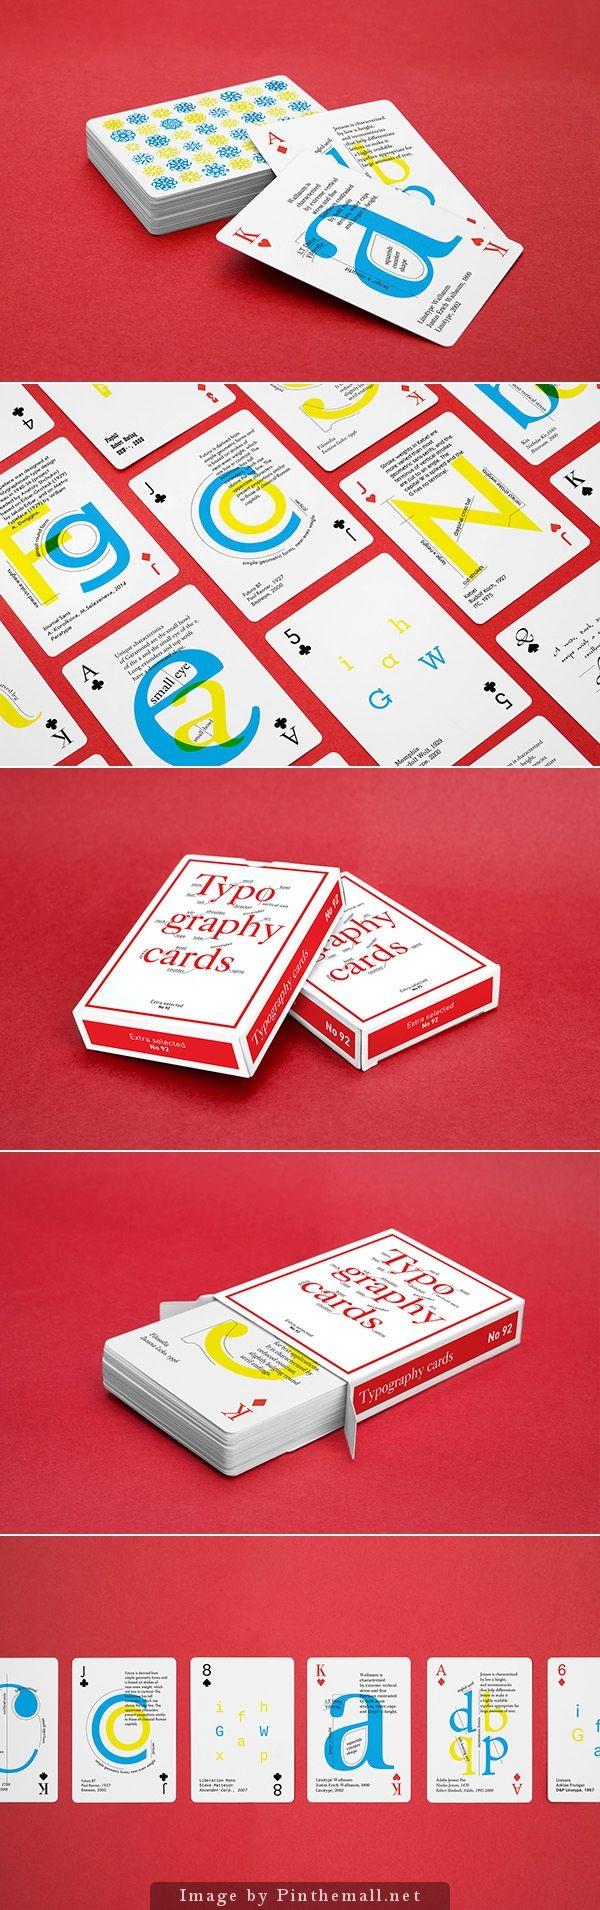 Typography cards by Anastasia Musaeva